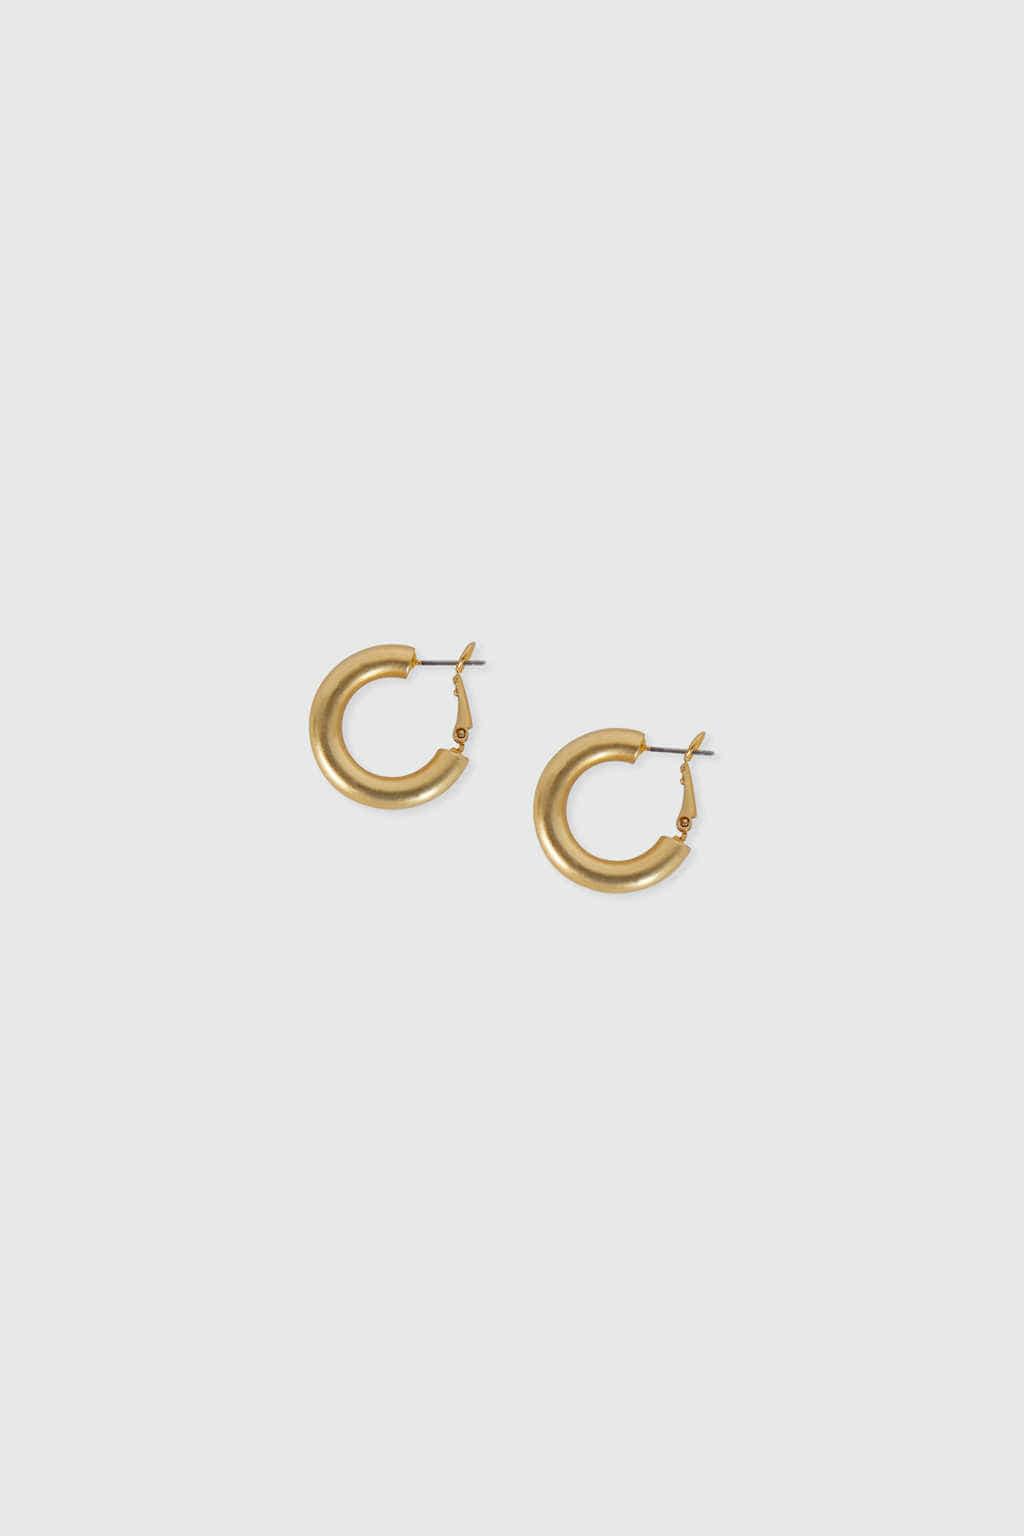 Earring J021 Gold 1